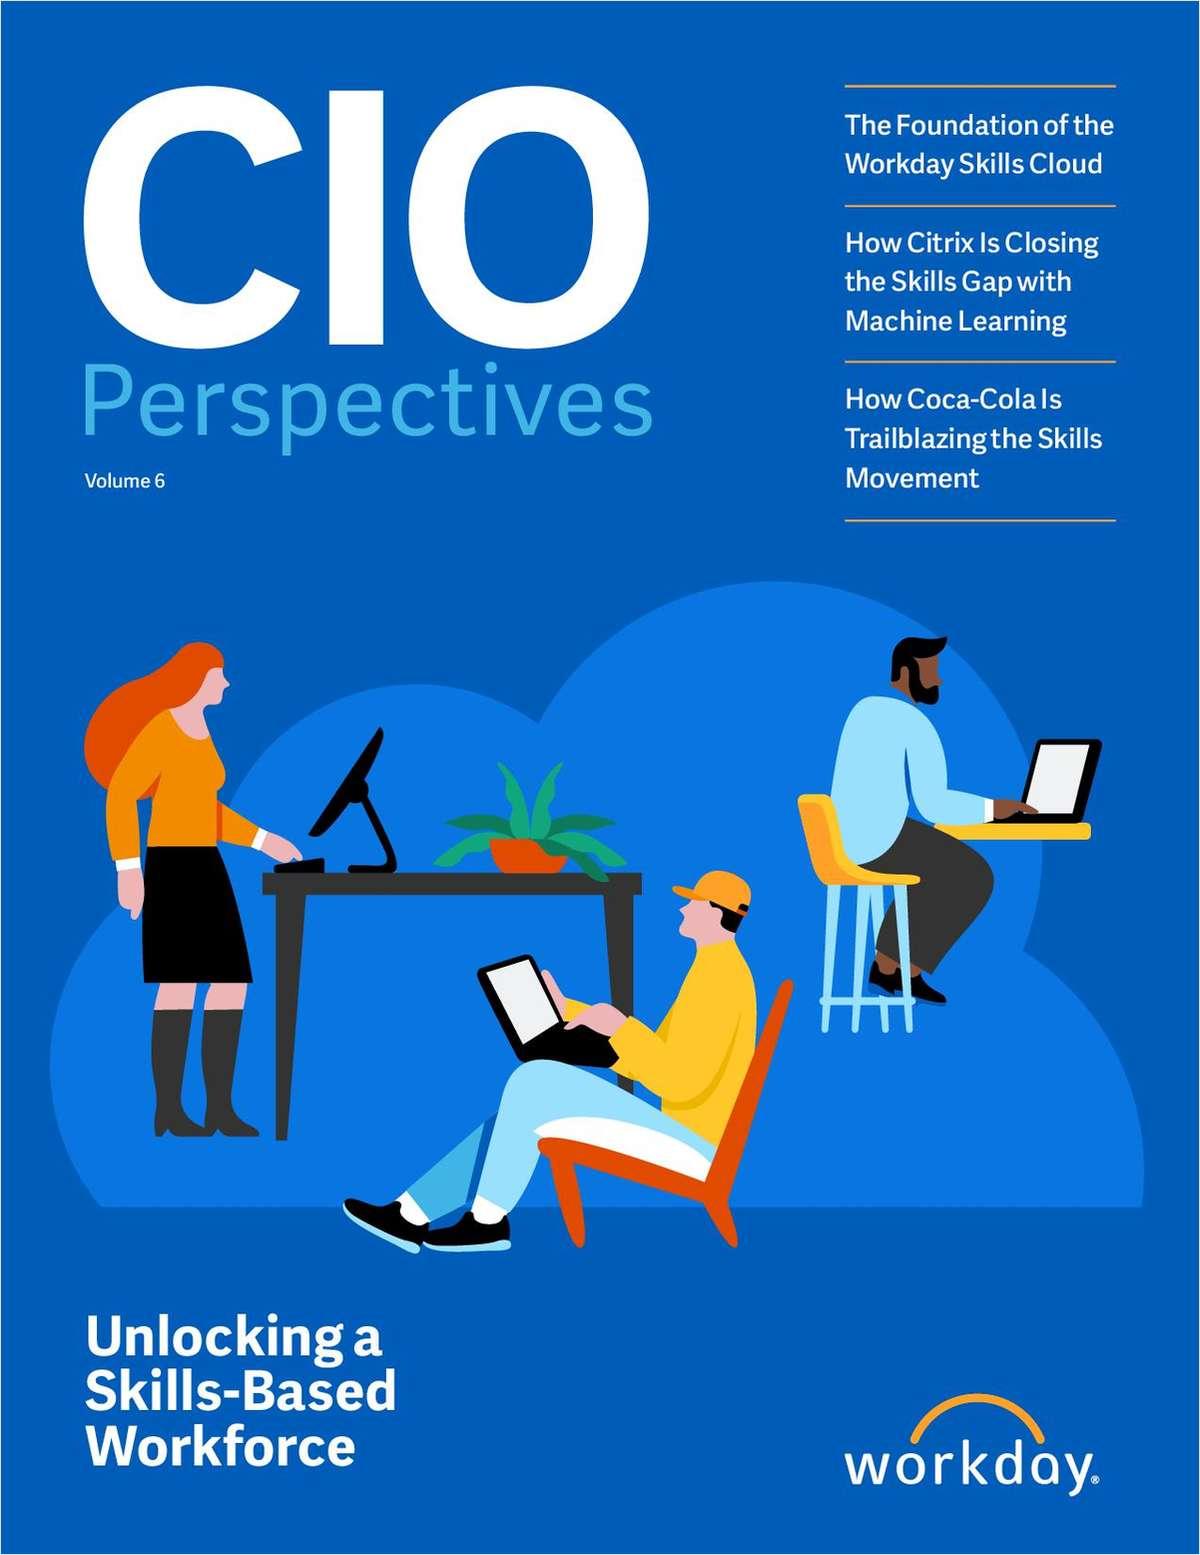 CIO Perspectives: Unlocking a Skills-Based Workforce